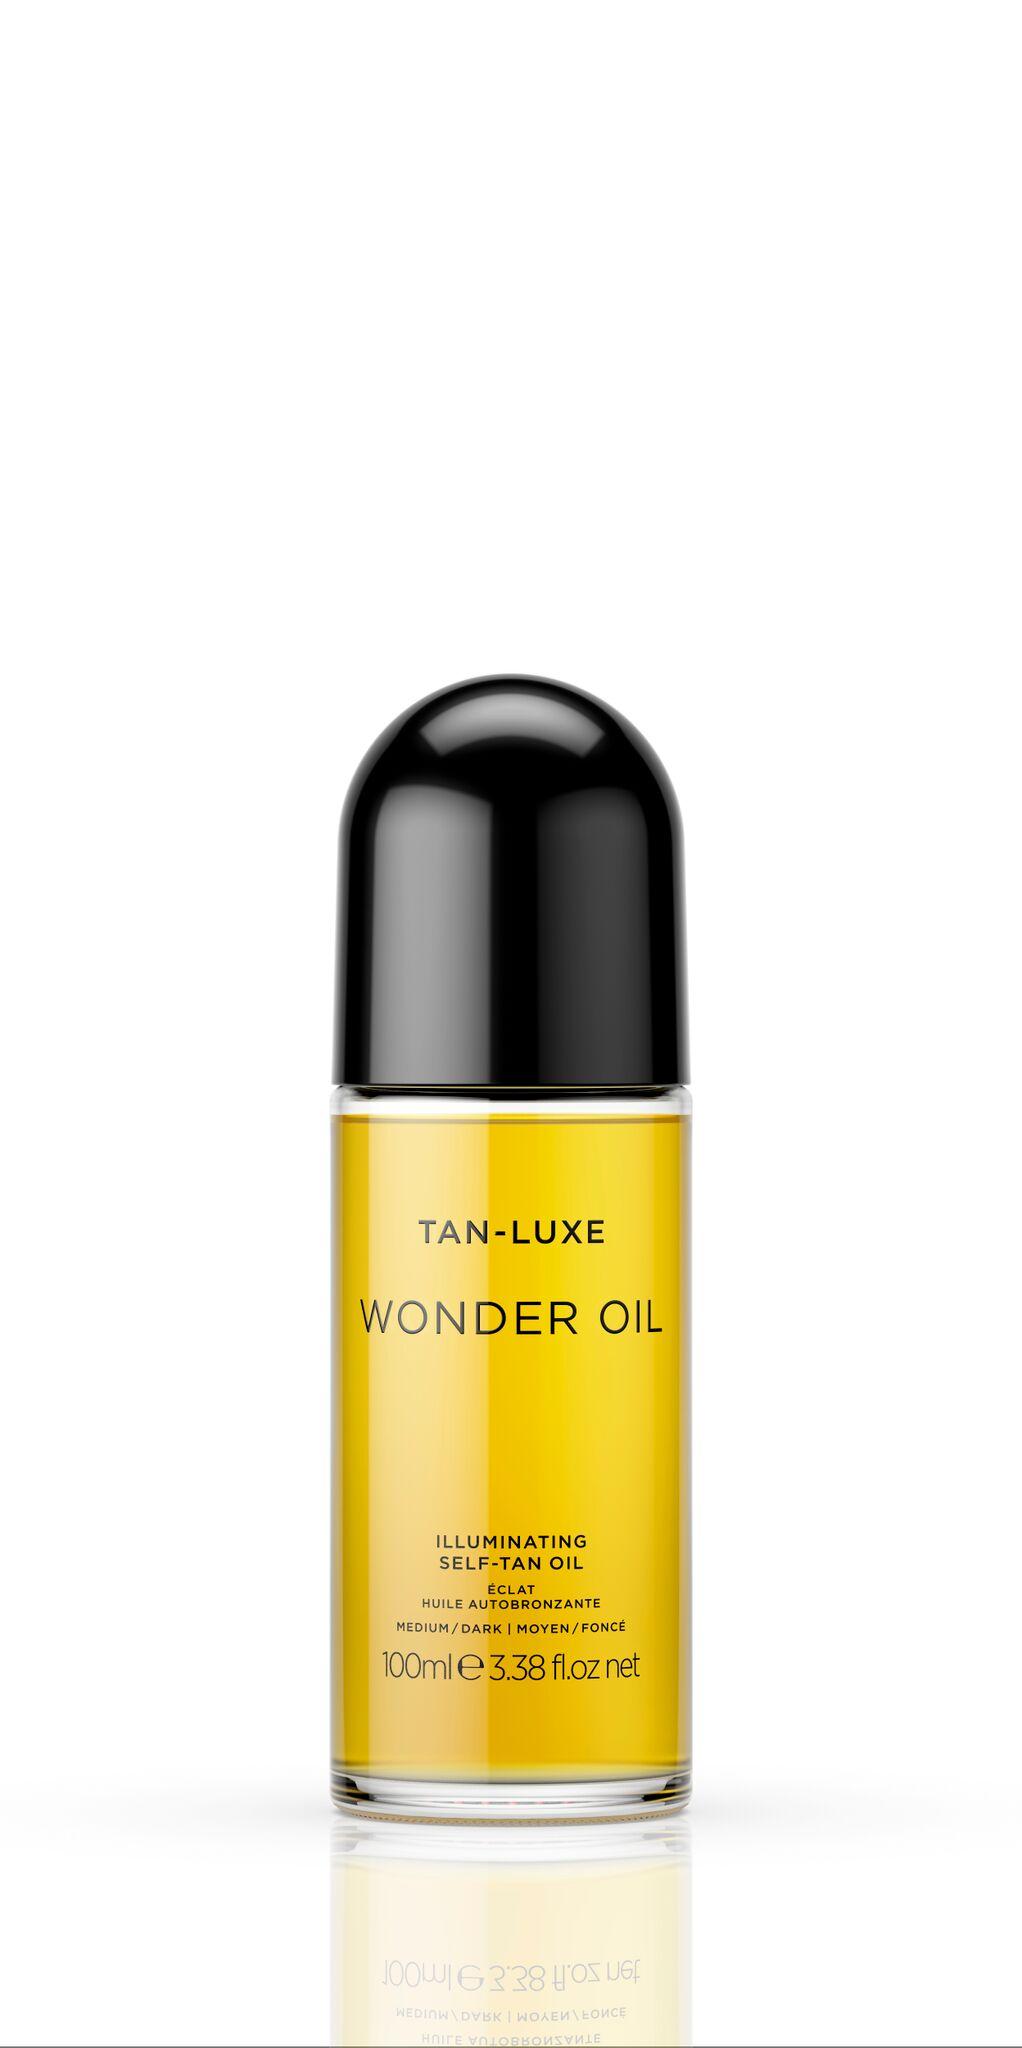 Tan Luxe Illumminating Self-Tan Wonder Oil, 100 ml, medium/dark